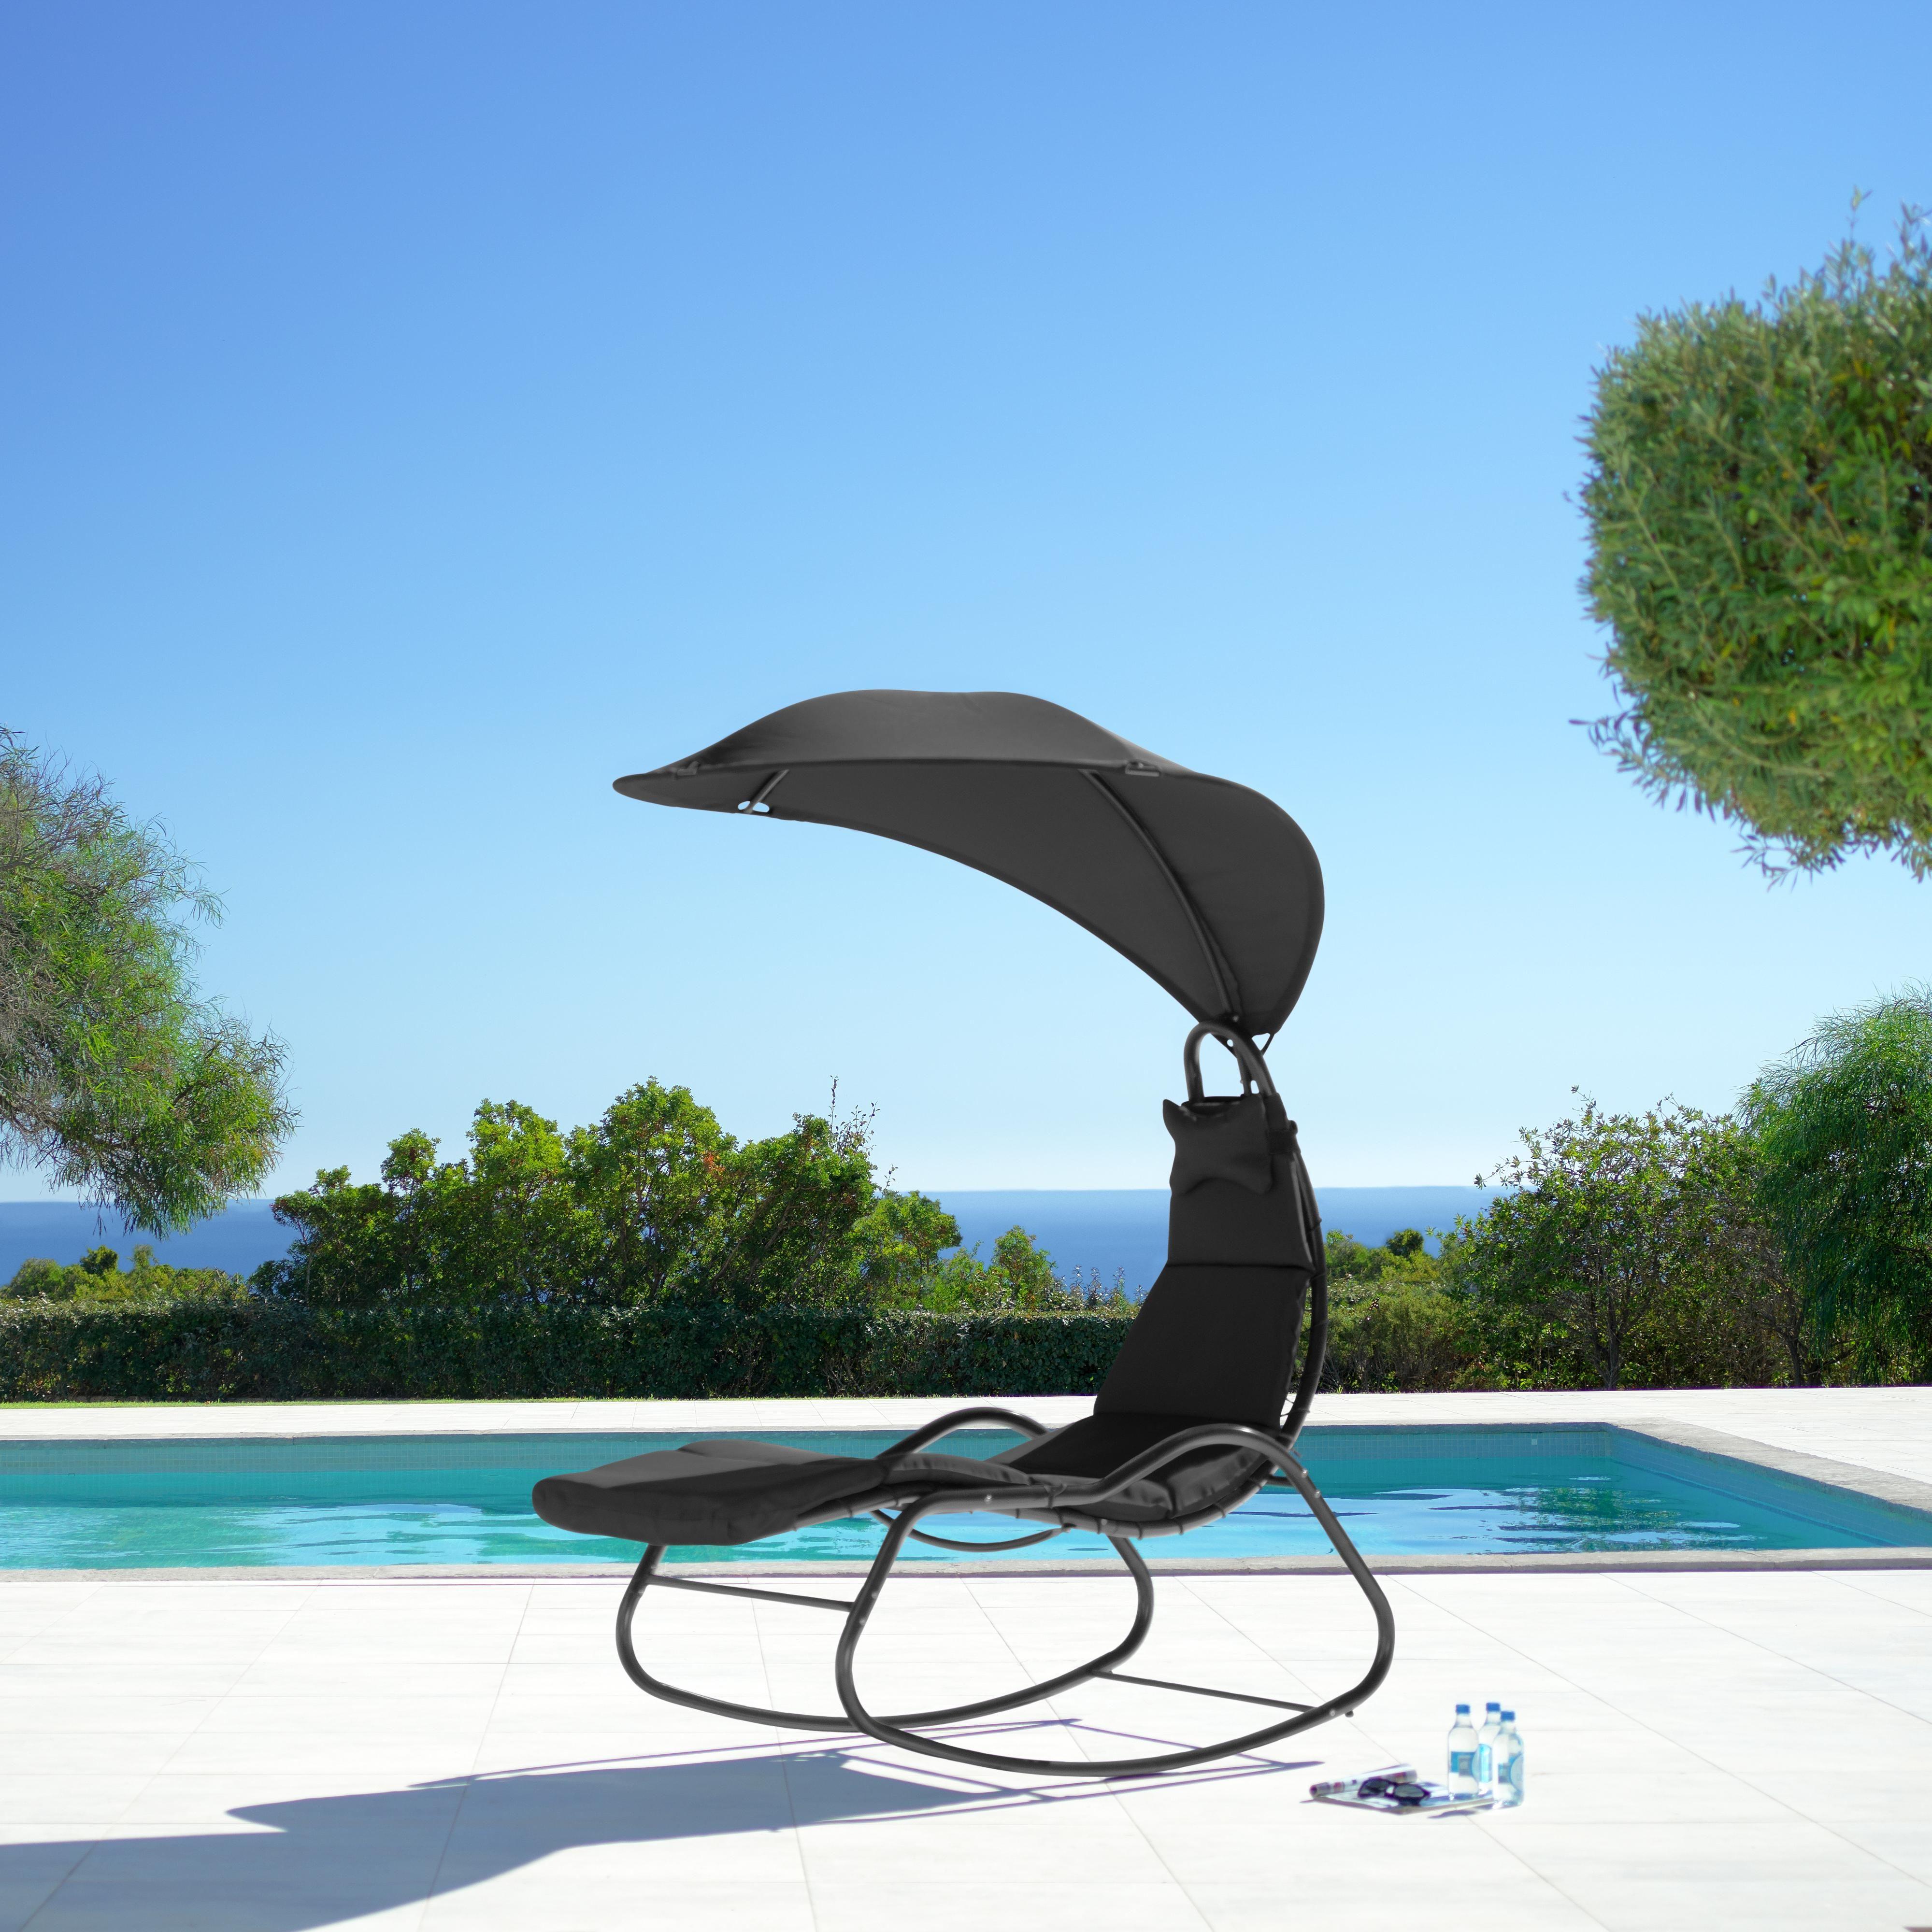 Relaxsessel Cori inkl. Auflage, Kissen & Dach - Dunkelgrau, MODERN, Textil/Metall (78-120/204/160cm) - Modern Living